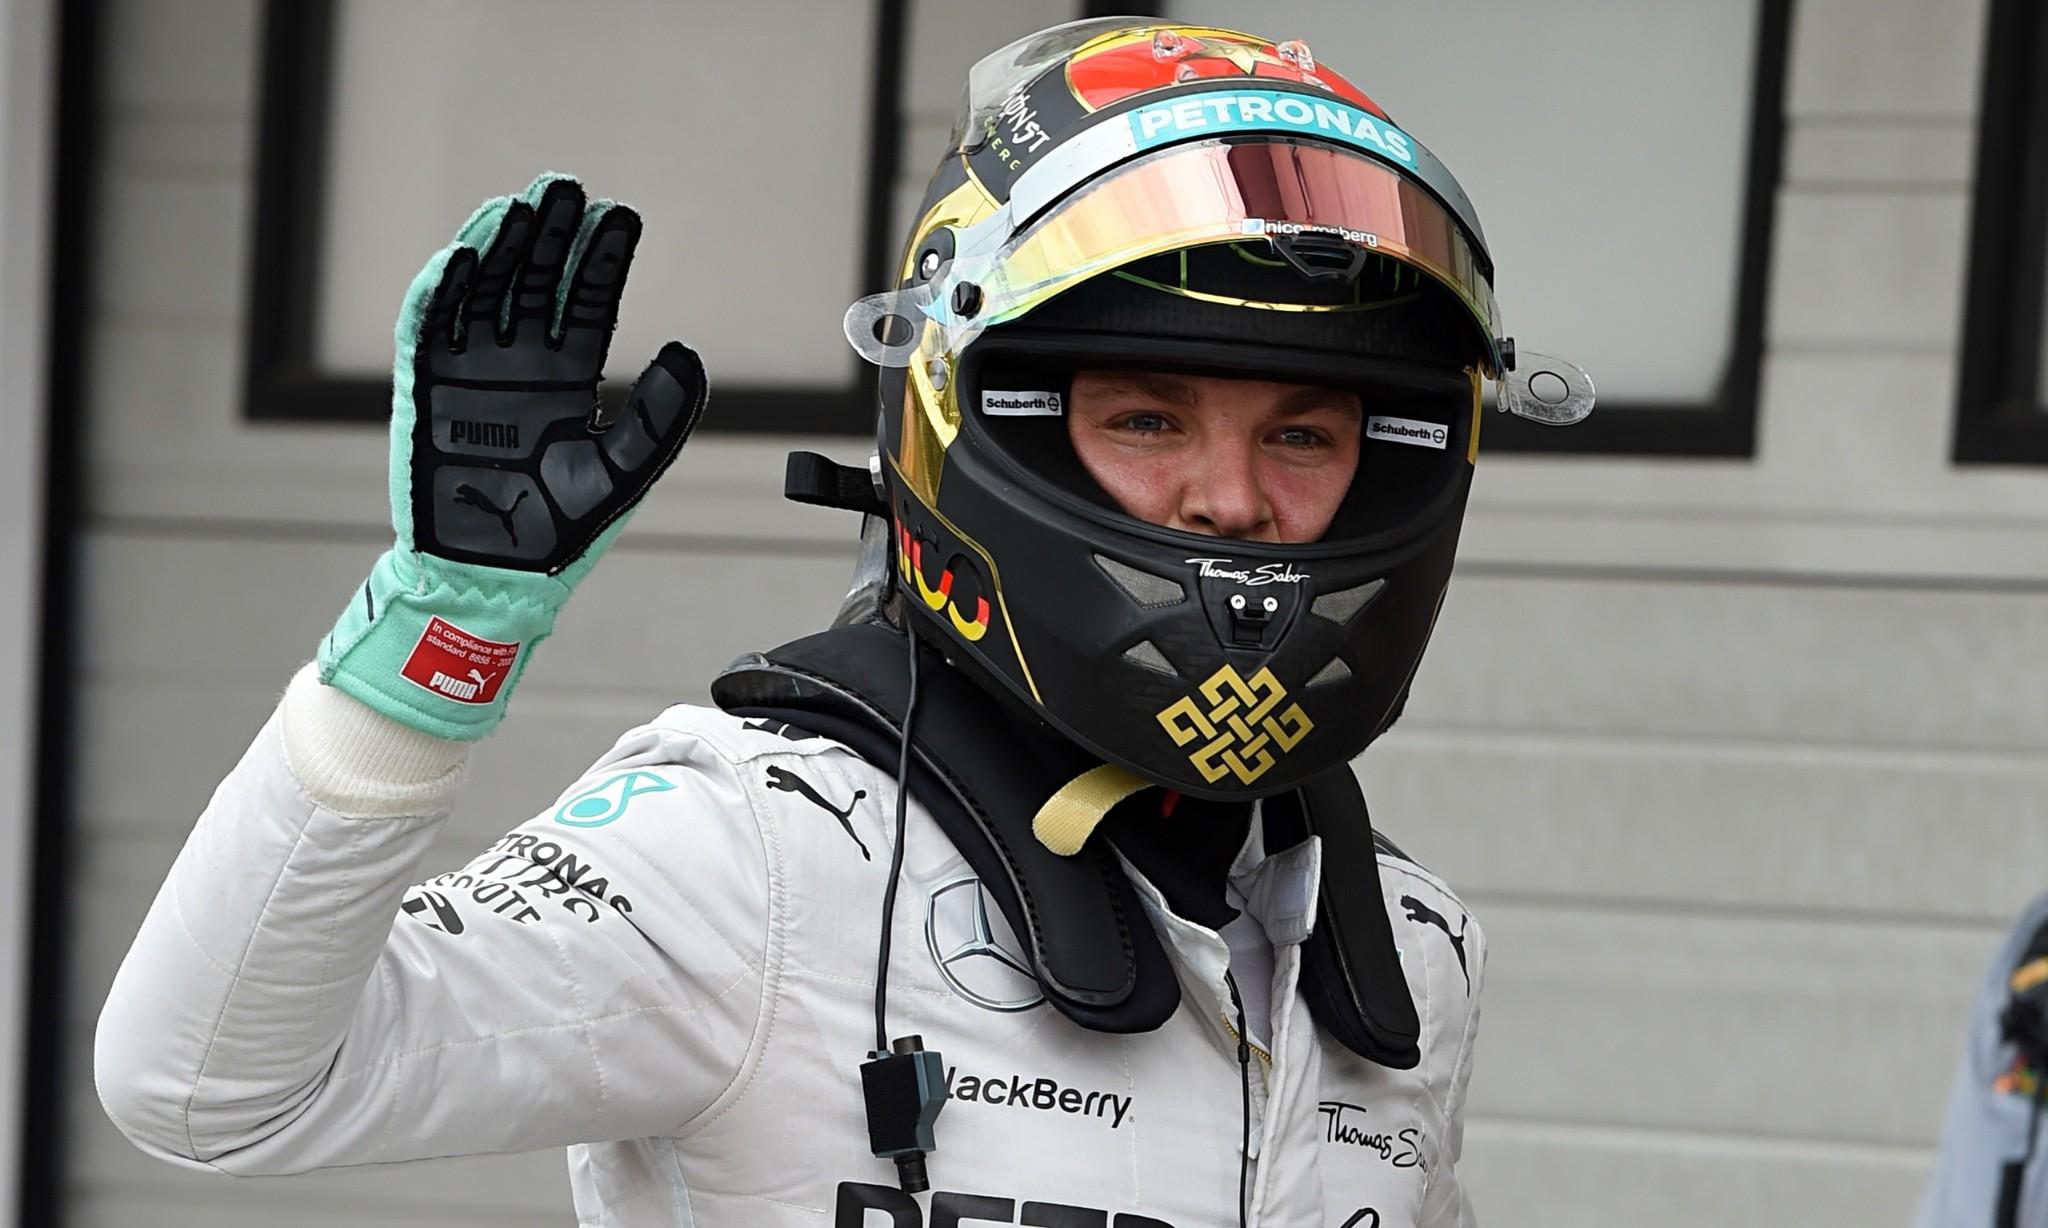 Lewis Hamilton suffers car fire while Nico Rosberg grabs Hungary pole